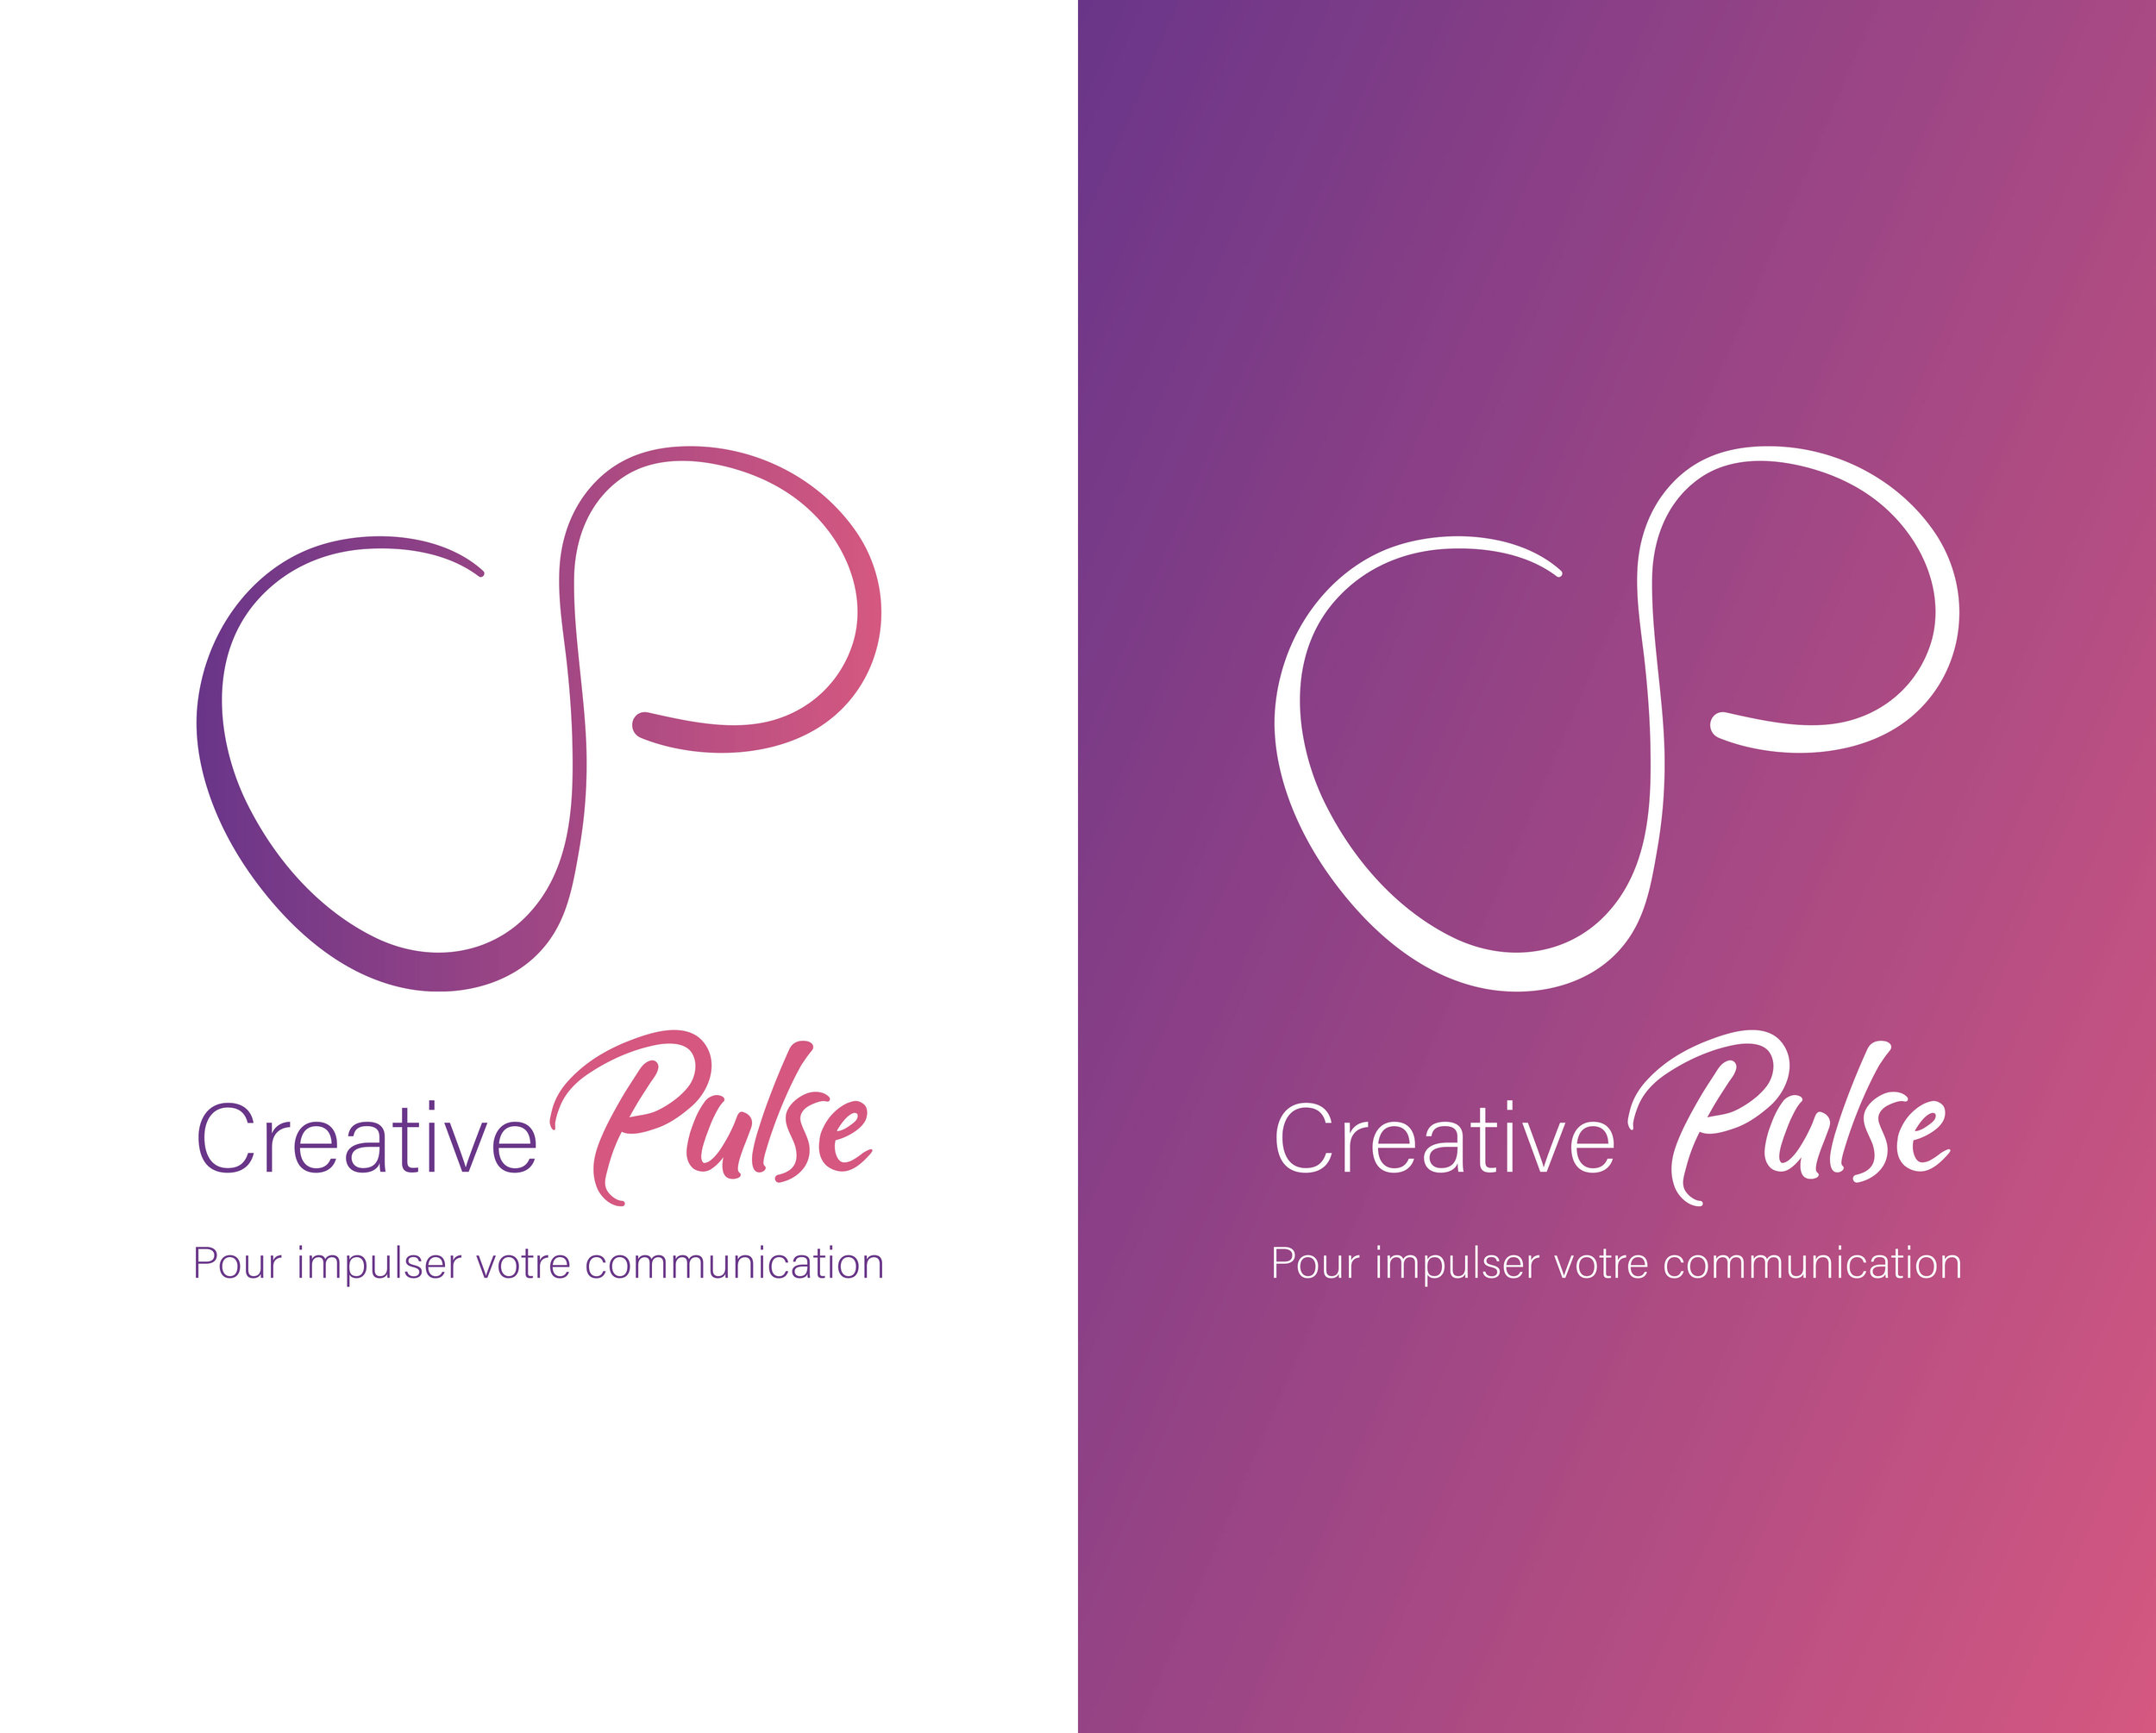 Creative-Pulse-Identite-Visuelle.jpg